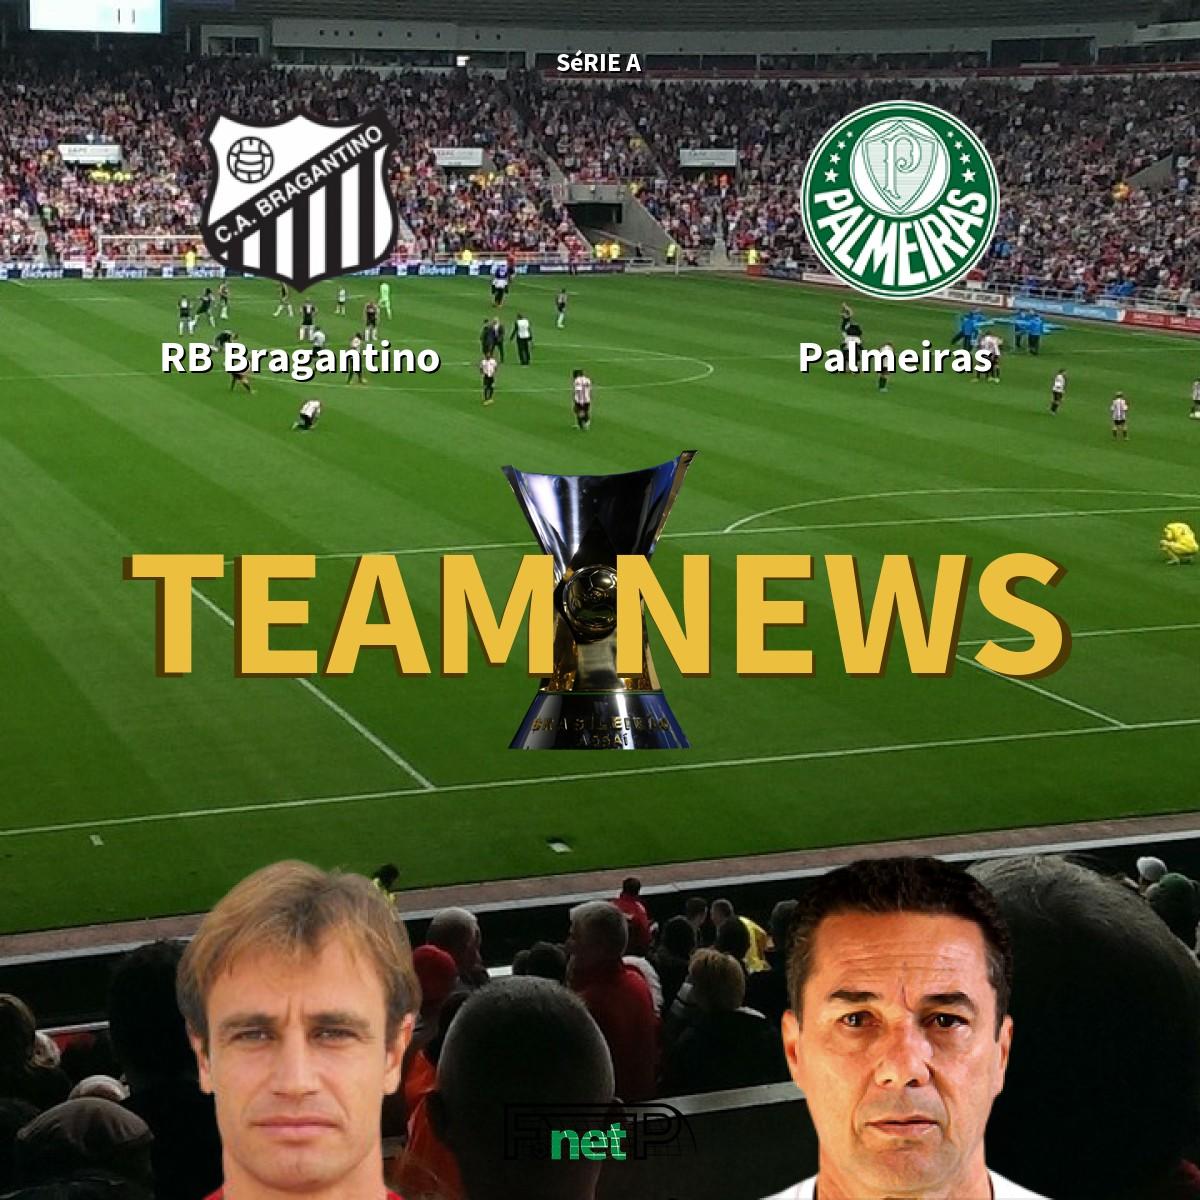 Serie A News Red Bull Bragantino Vs Palmeiras Confirmed Line Ups